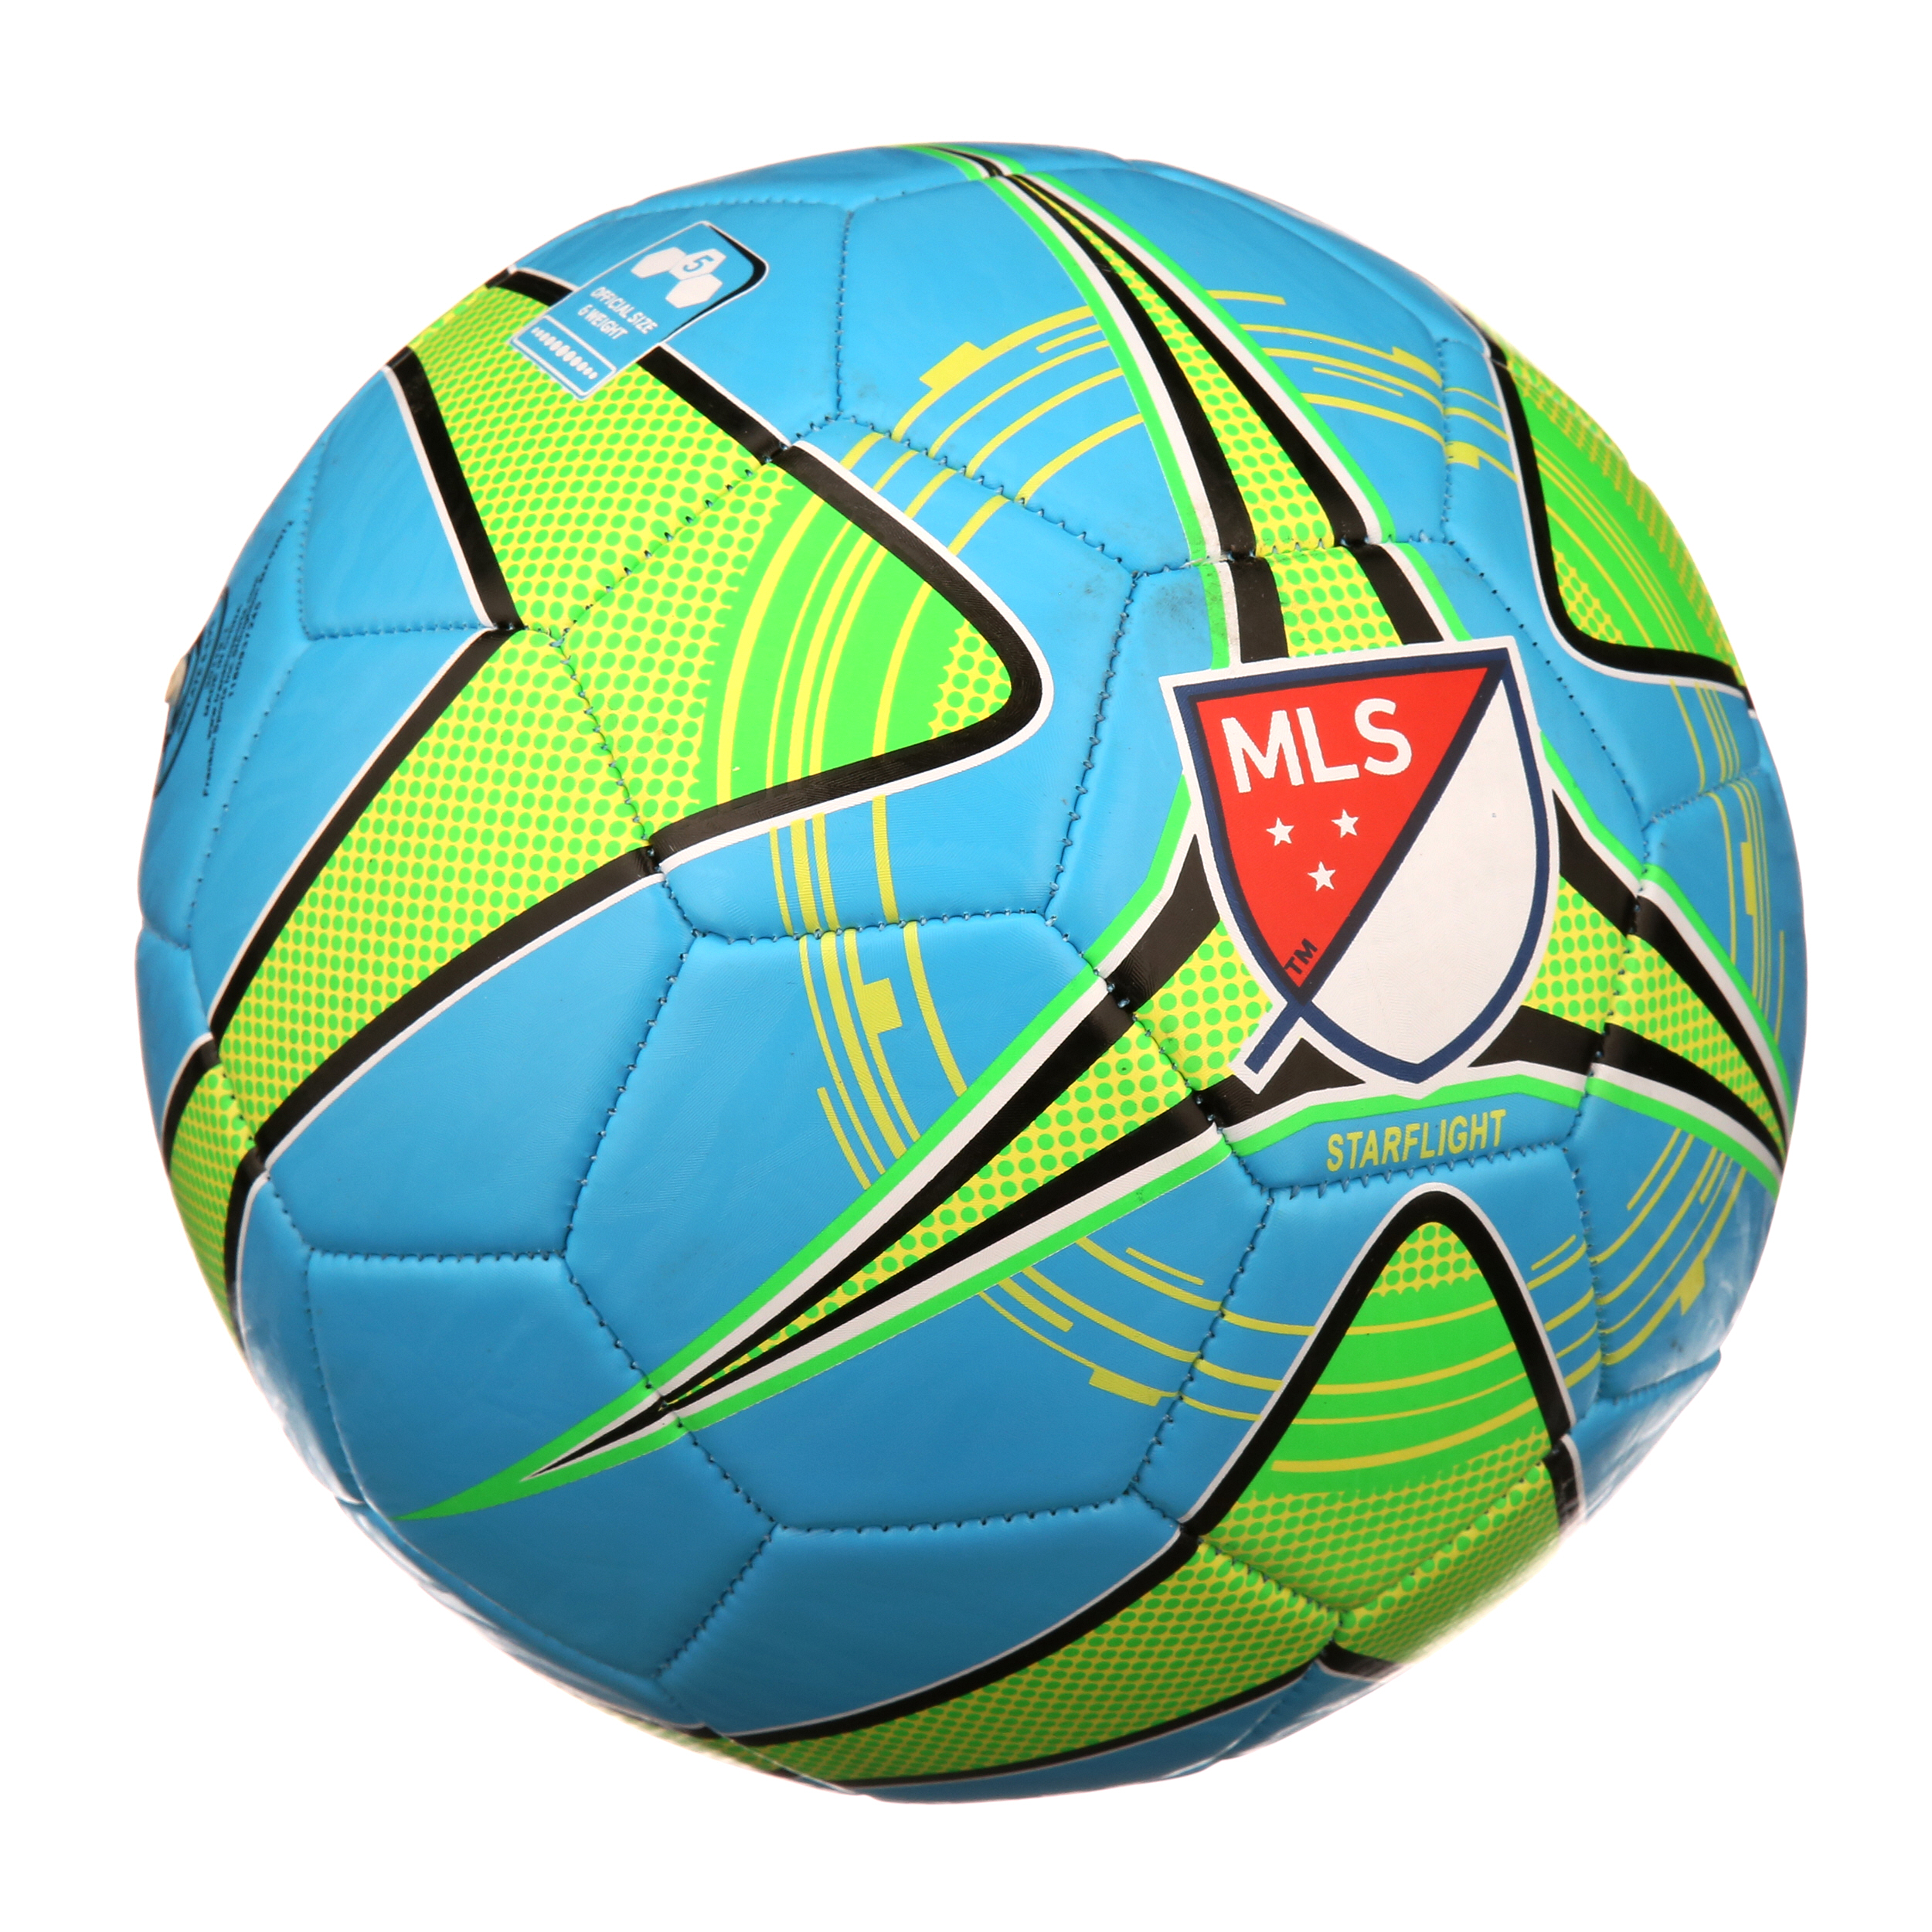 Honduras Arza Soccer Ball Couleur Bleu Taille 5